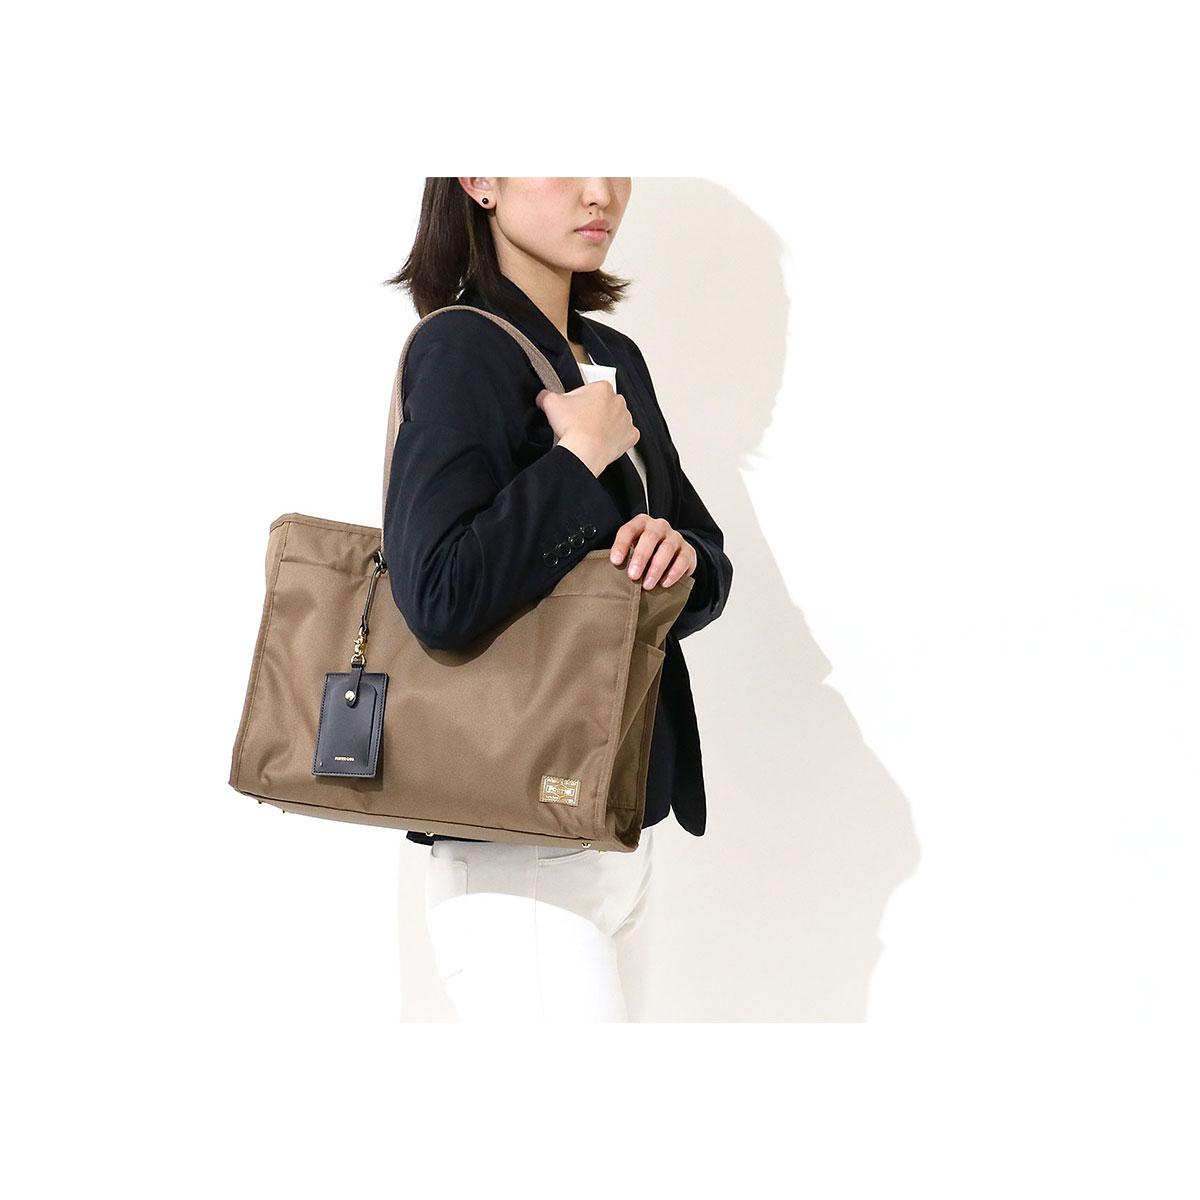 PORTER GIRL佘手提包(L)与日本871-05120做的手提袋拉链A4女士尼龙通勤通勤包